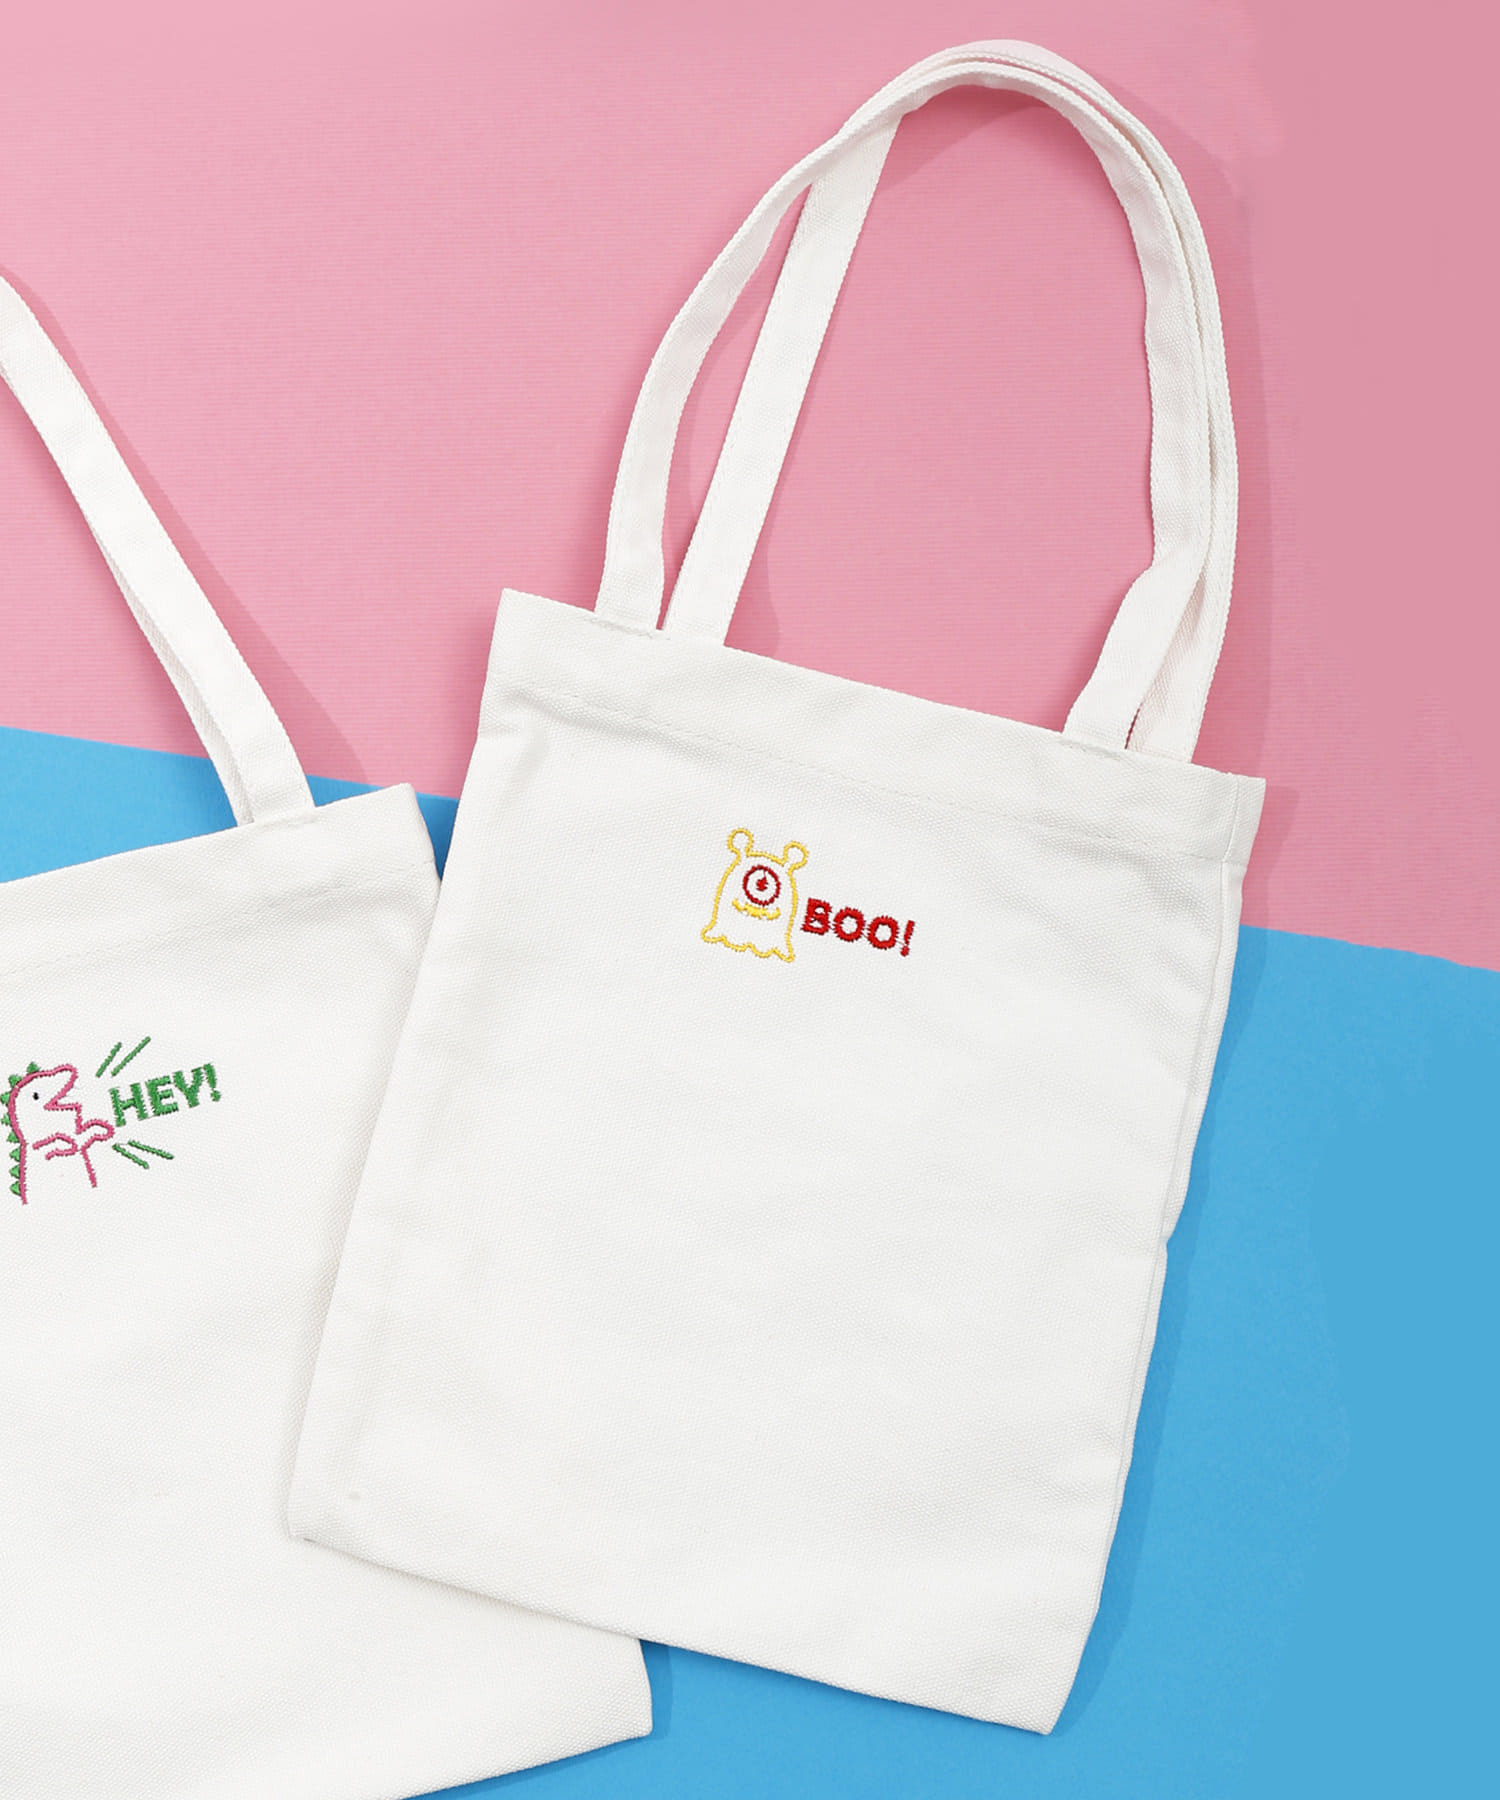 3COINS(スリーコインズ) 【ASOKO】<刺繍がPOPでカワイイ♡>ミニトートバッグ